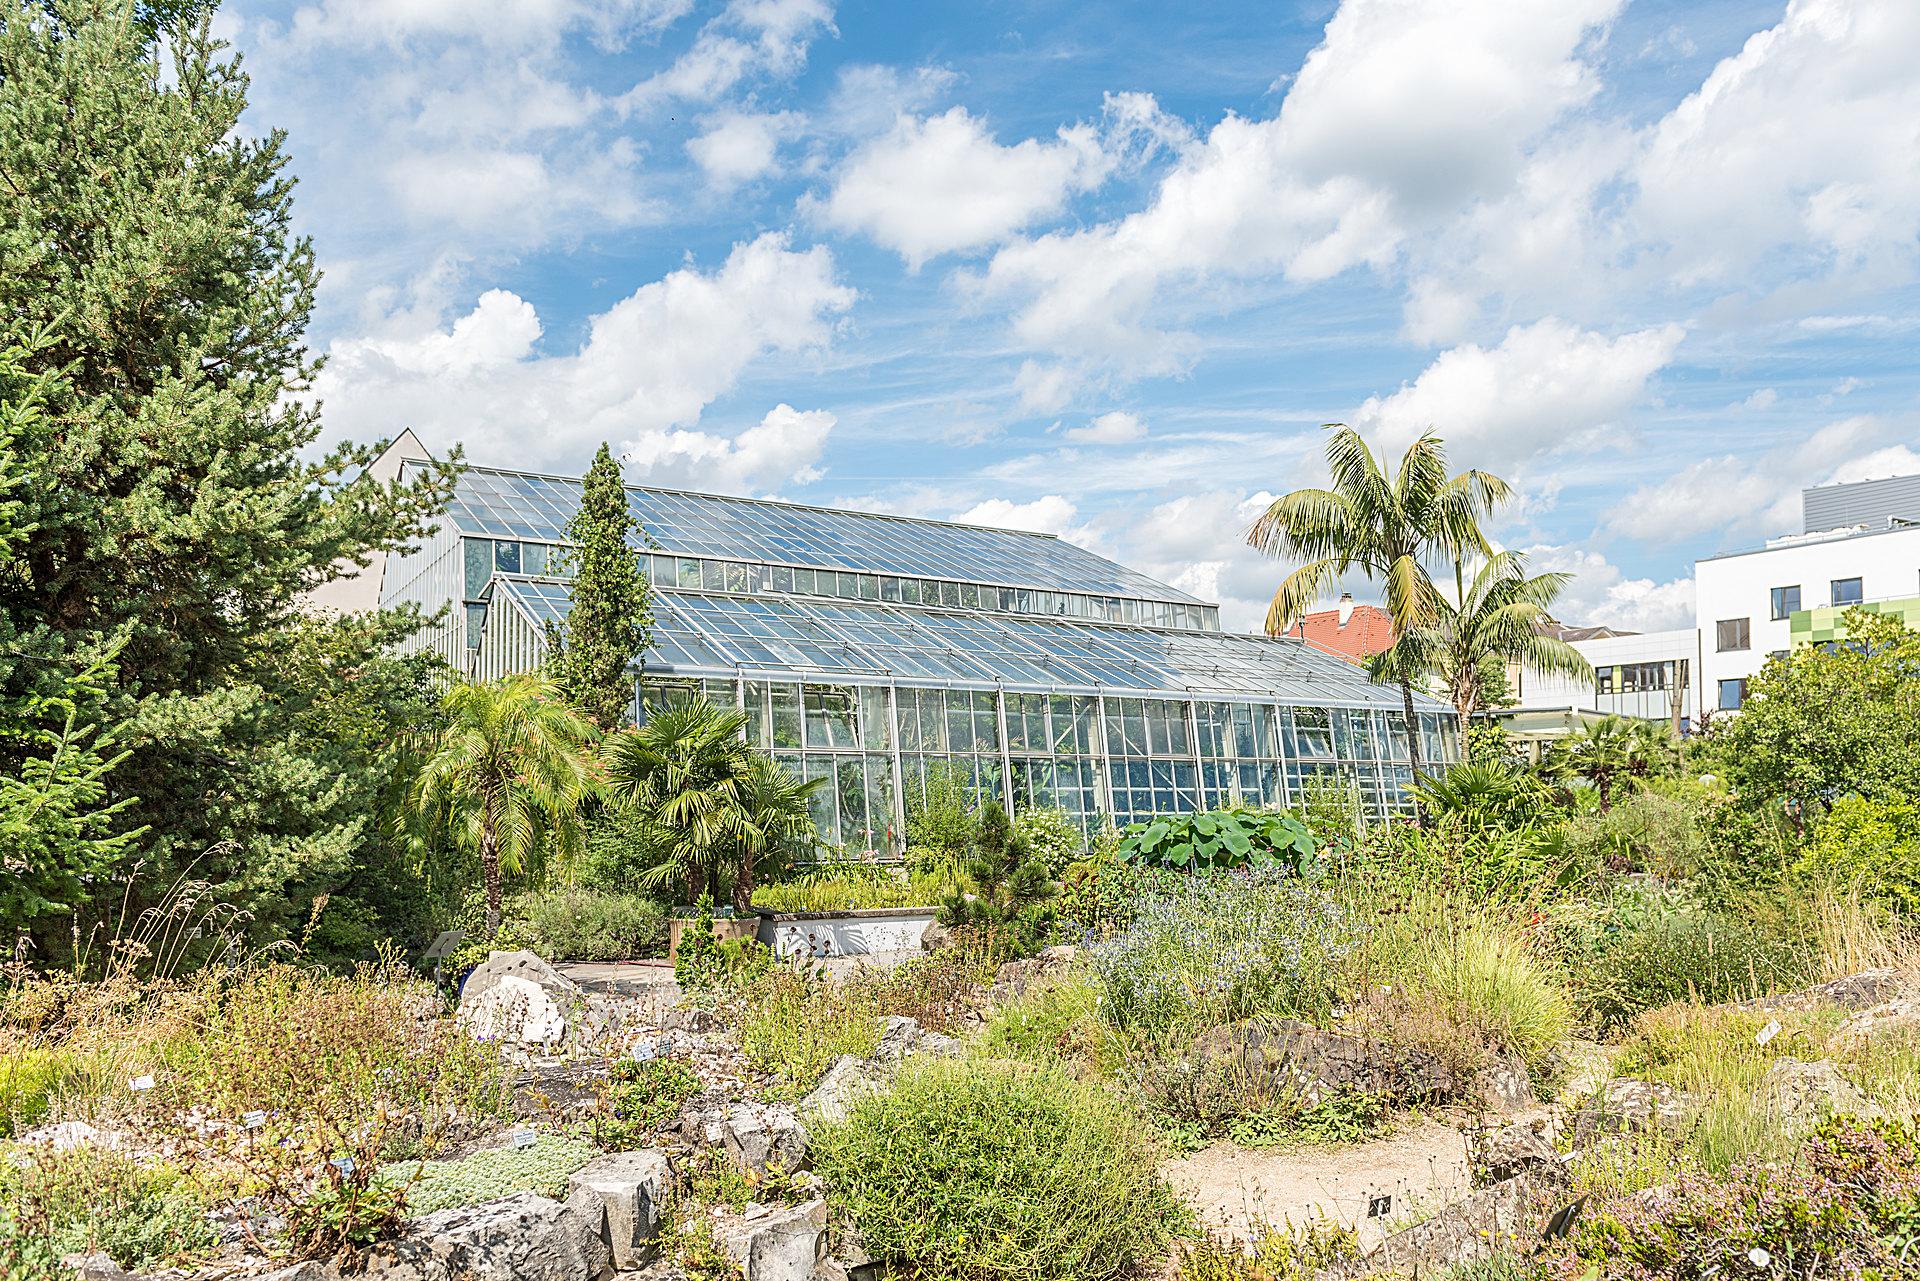 Gartenbau Erlangen erlangen botanische gärten in erlangen